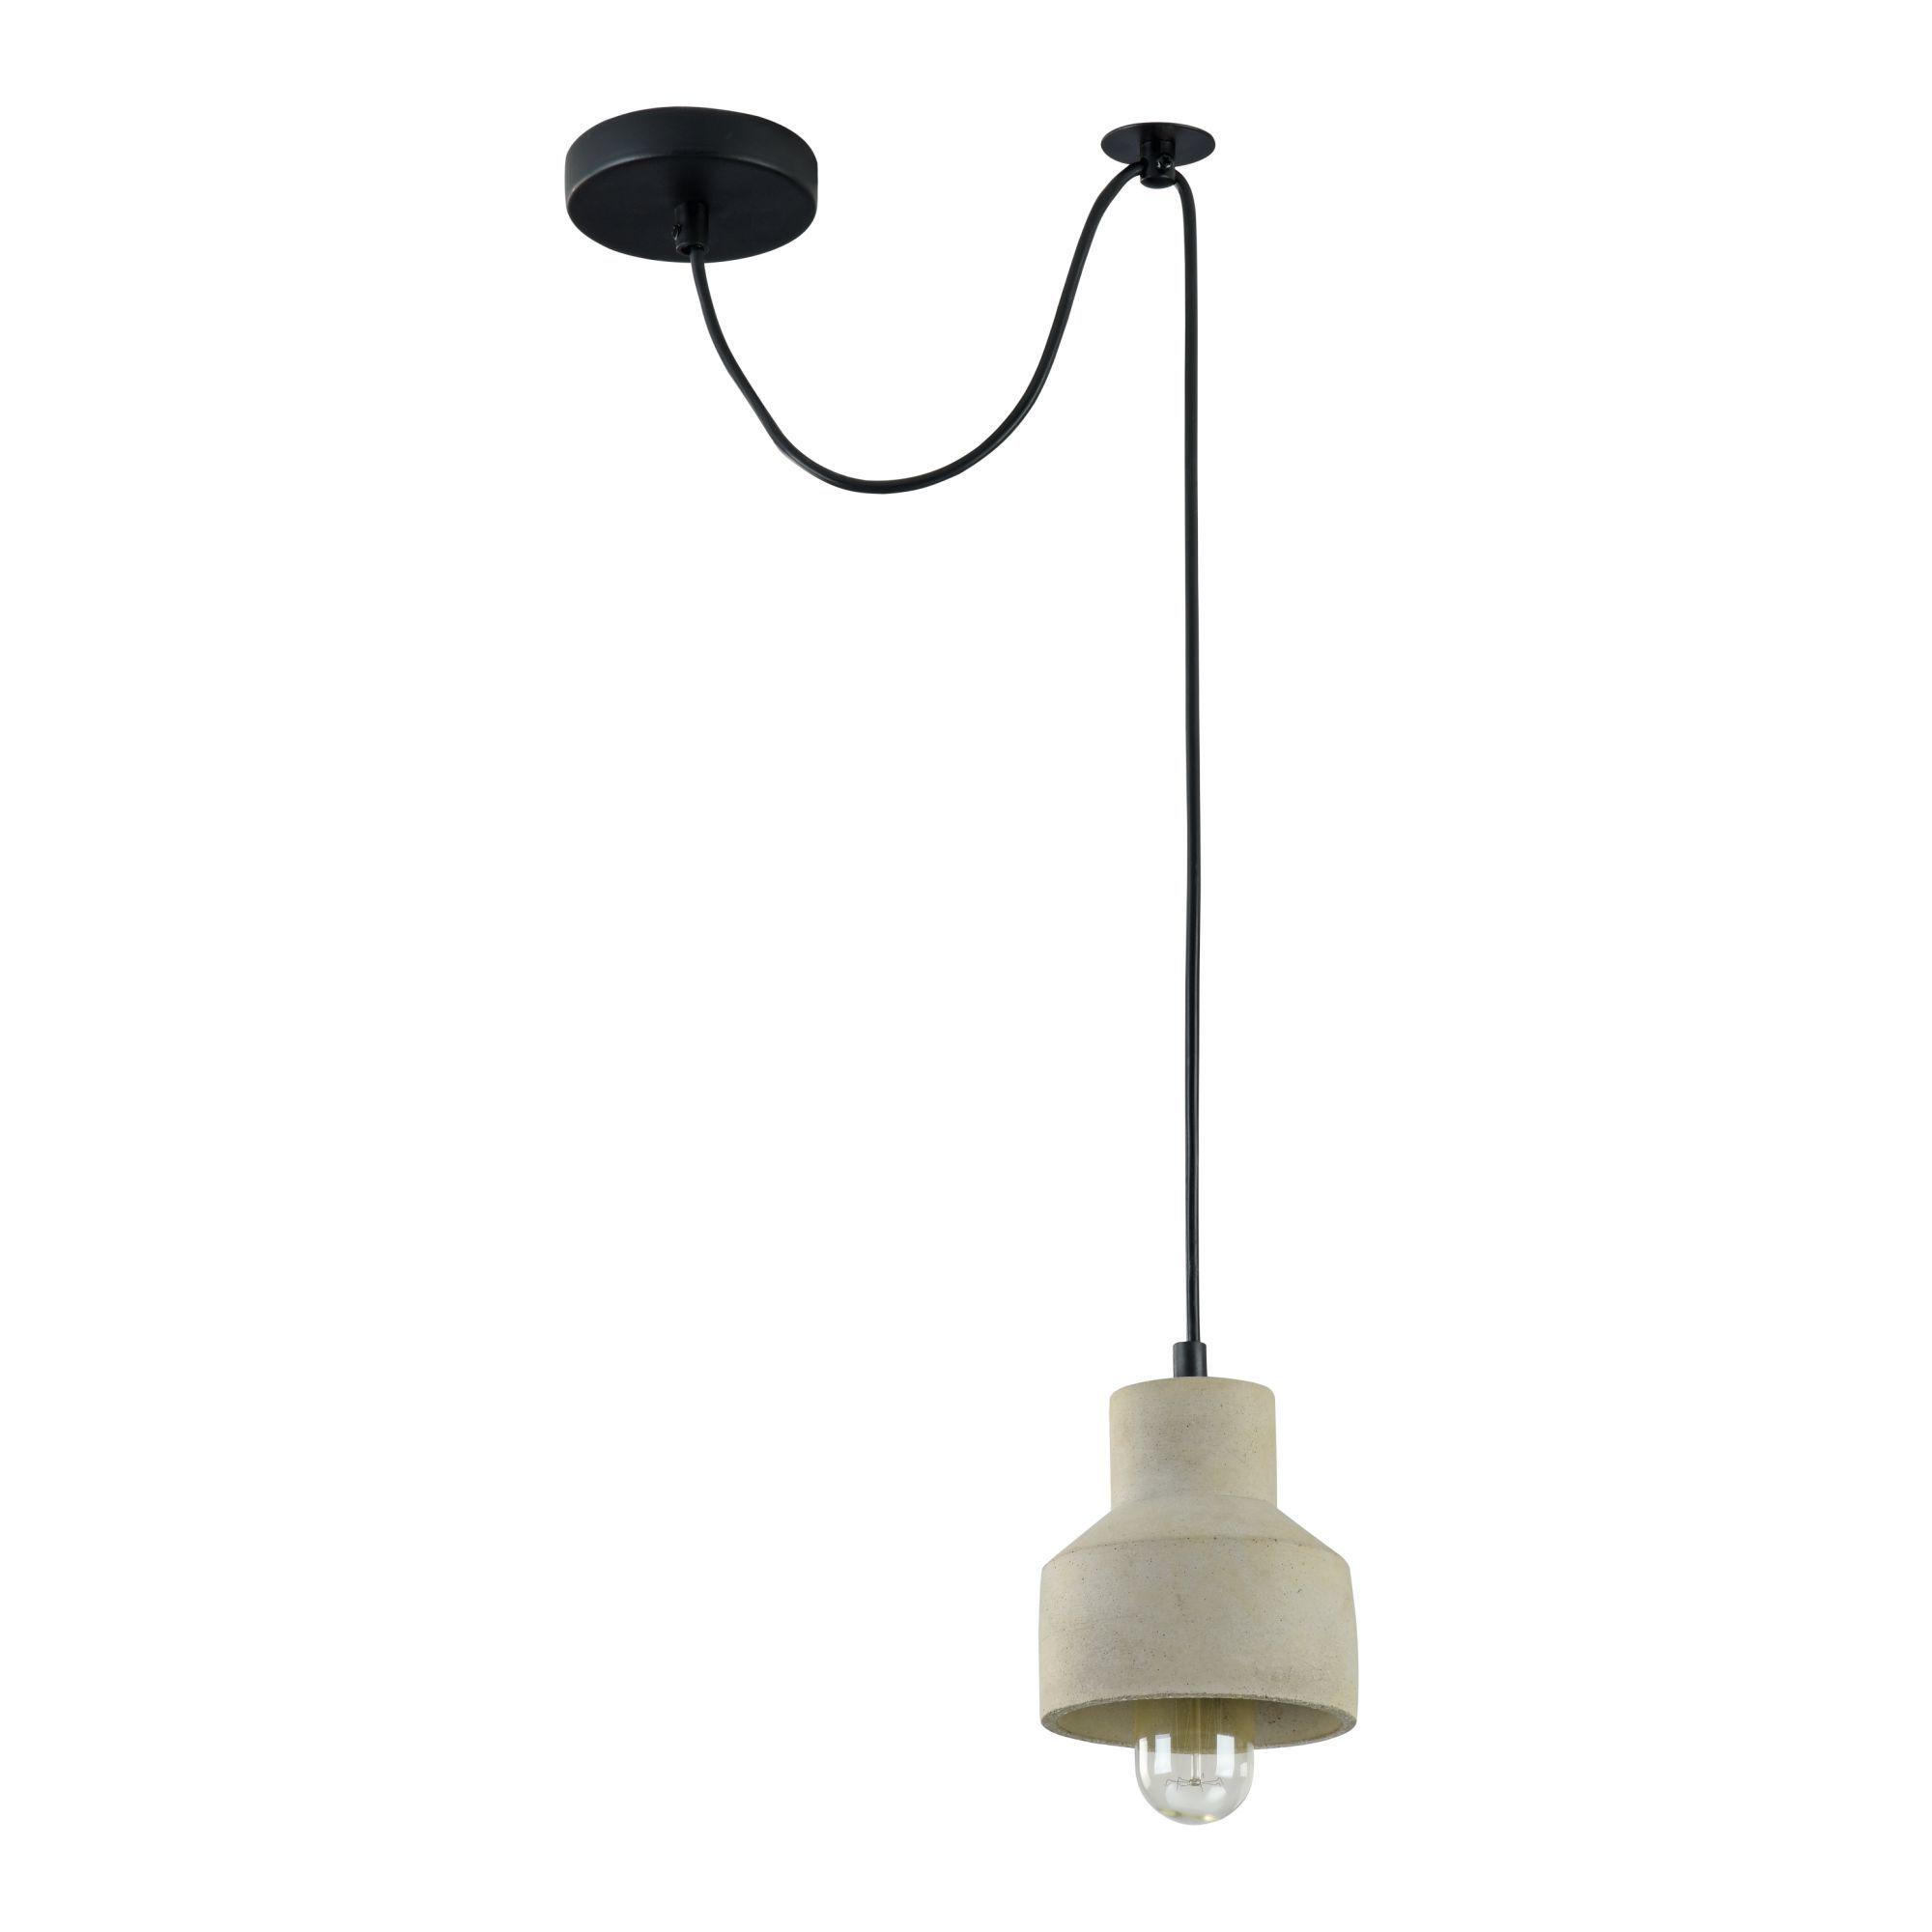 Подвесной светильник Maytoni Broni T437-PL-01-GR, 1xE27x60W, черный, серый, металл, бетон - фото 2